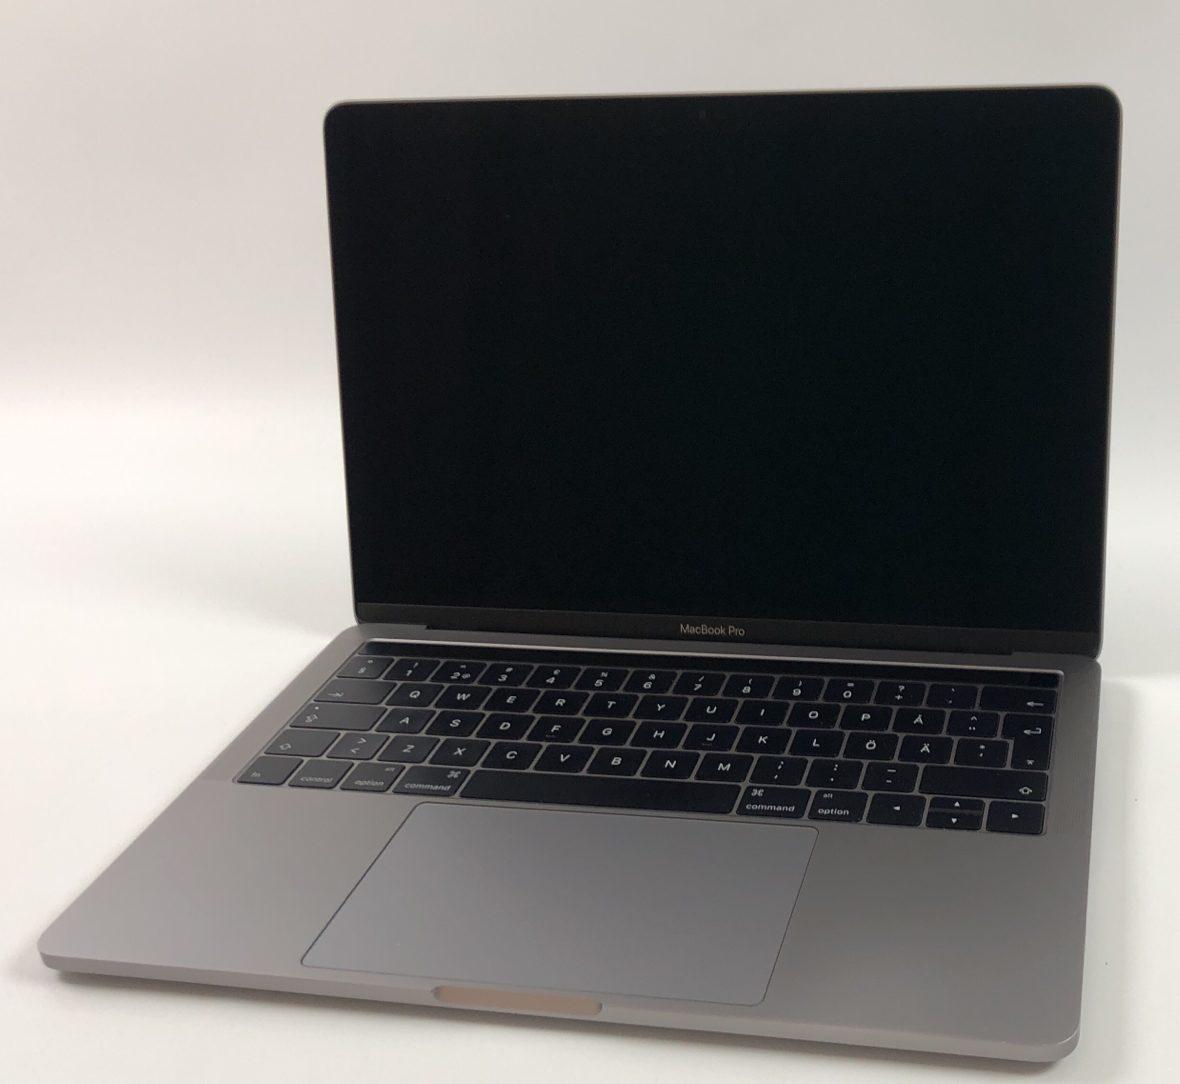 "MacBook Pro 13"" 4TBT Late 2016 (Intel Core i5 2.9 GHz 8 GB RAM 512 GB SSD), Space Gray, Intel Core i5 2.9 GHz, 8 GB RAM, 512 GB SSD, Kuva 1"